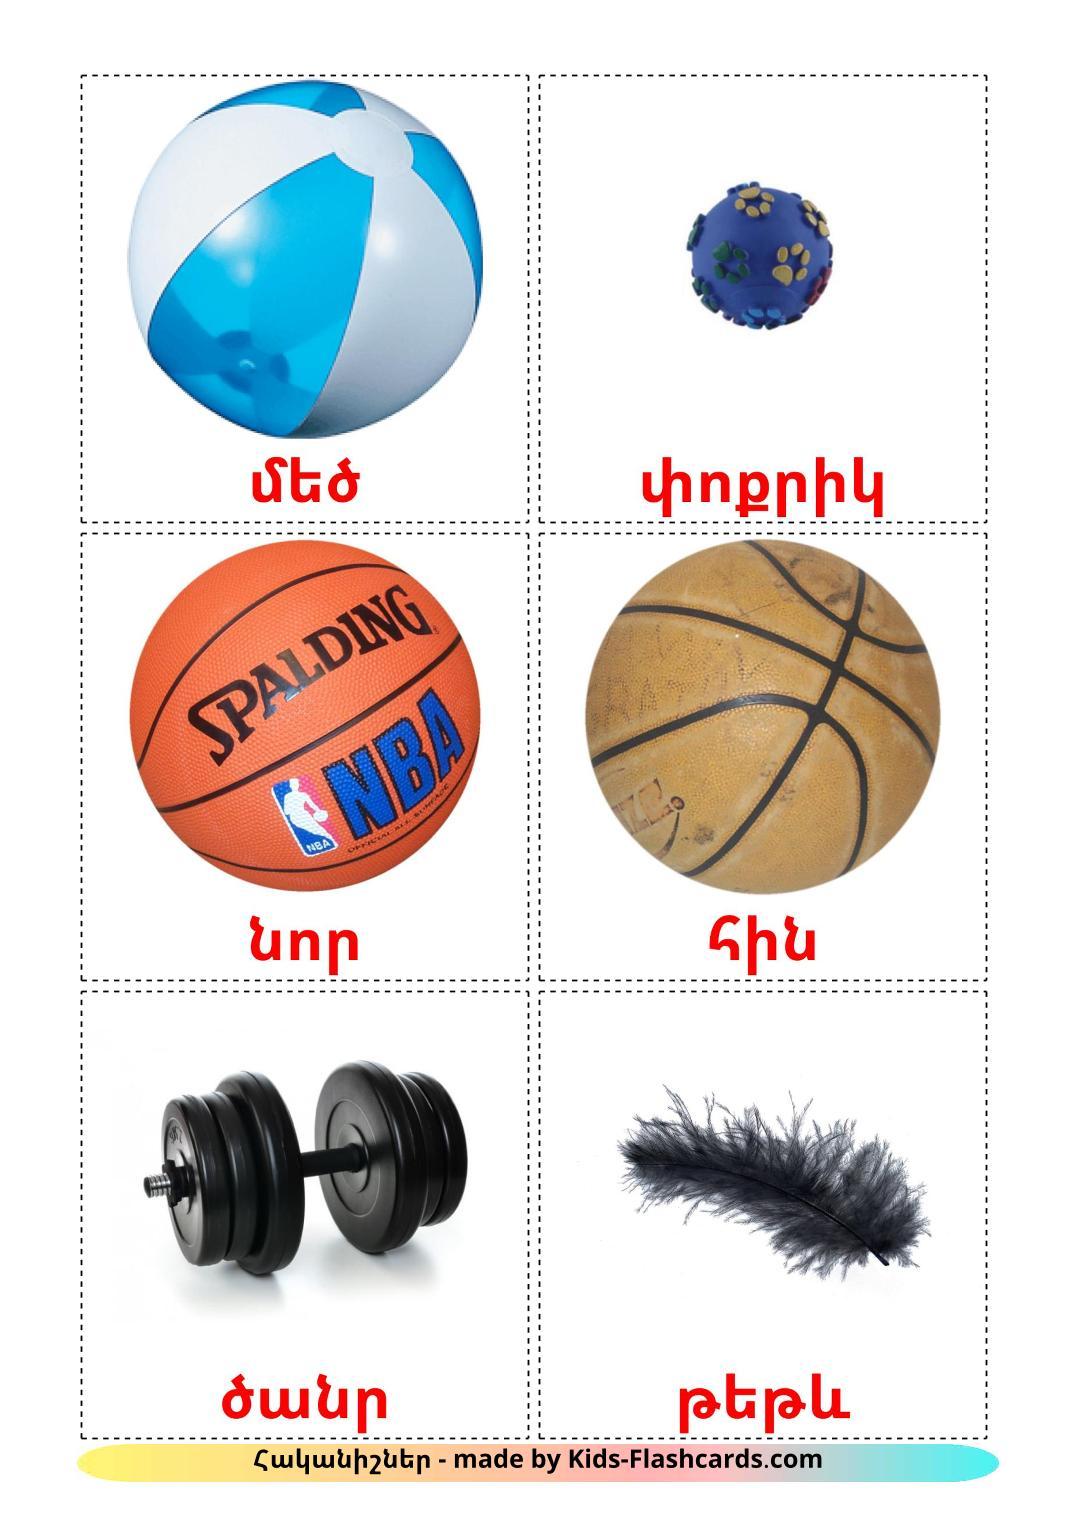 Opposites - 74 Free Printable armenian Flashcards